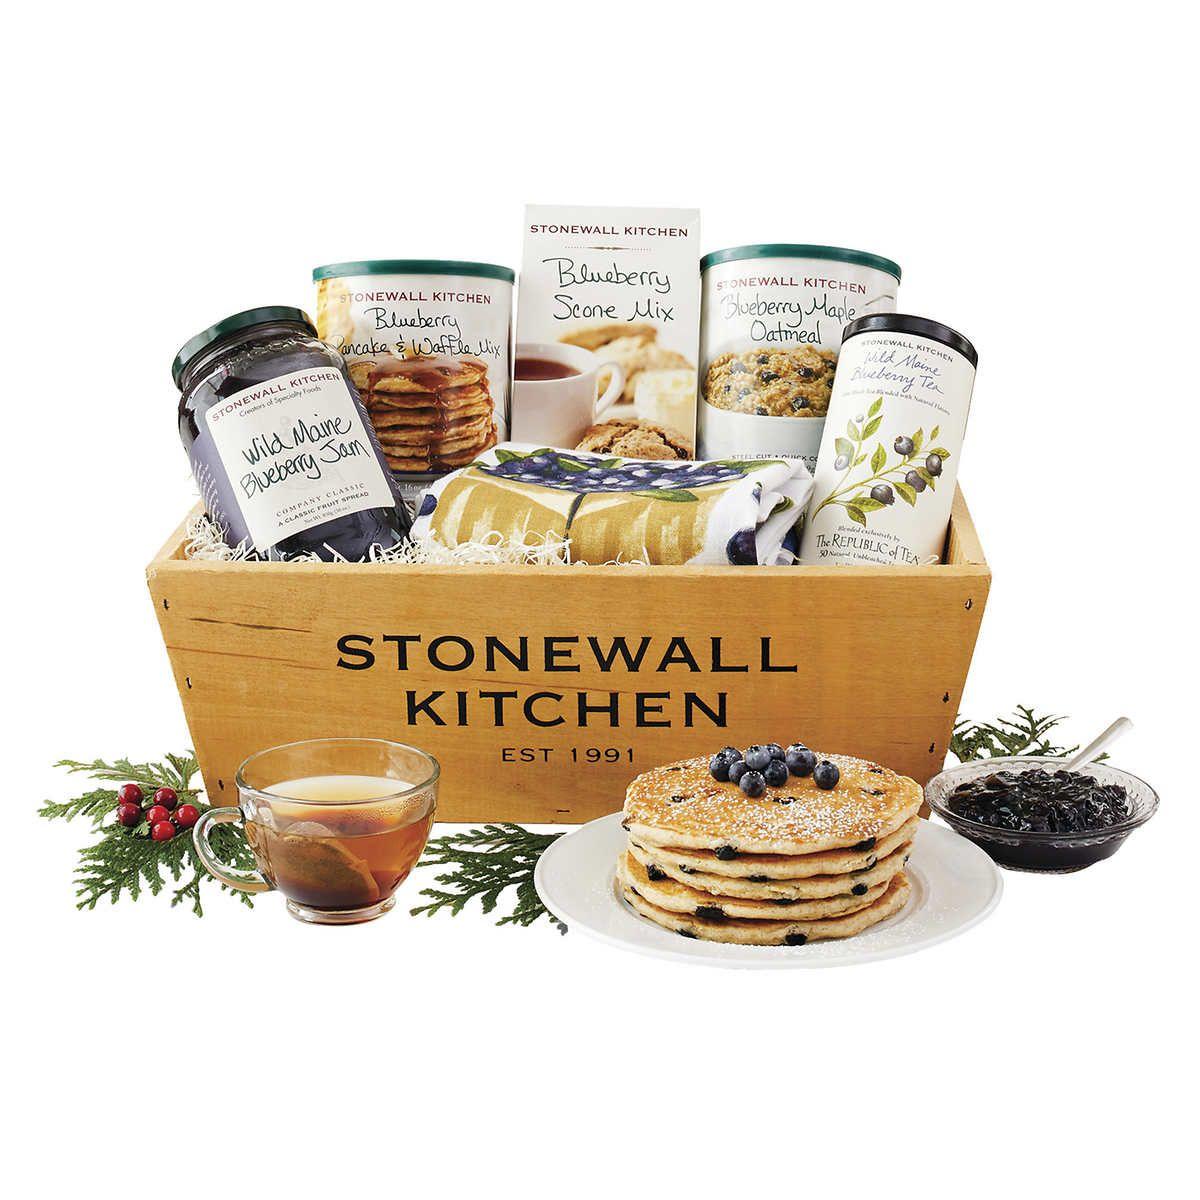 Stonewall Kitchen Blueberry Jam Costco